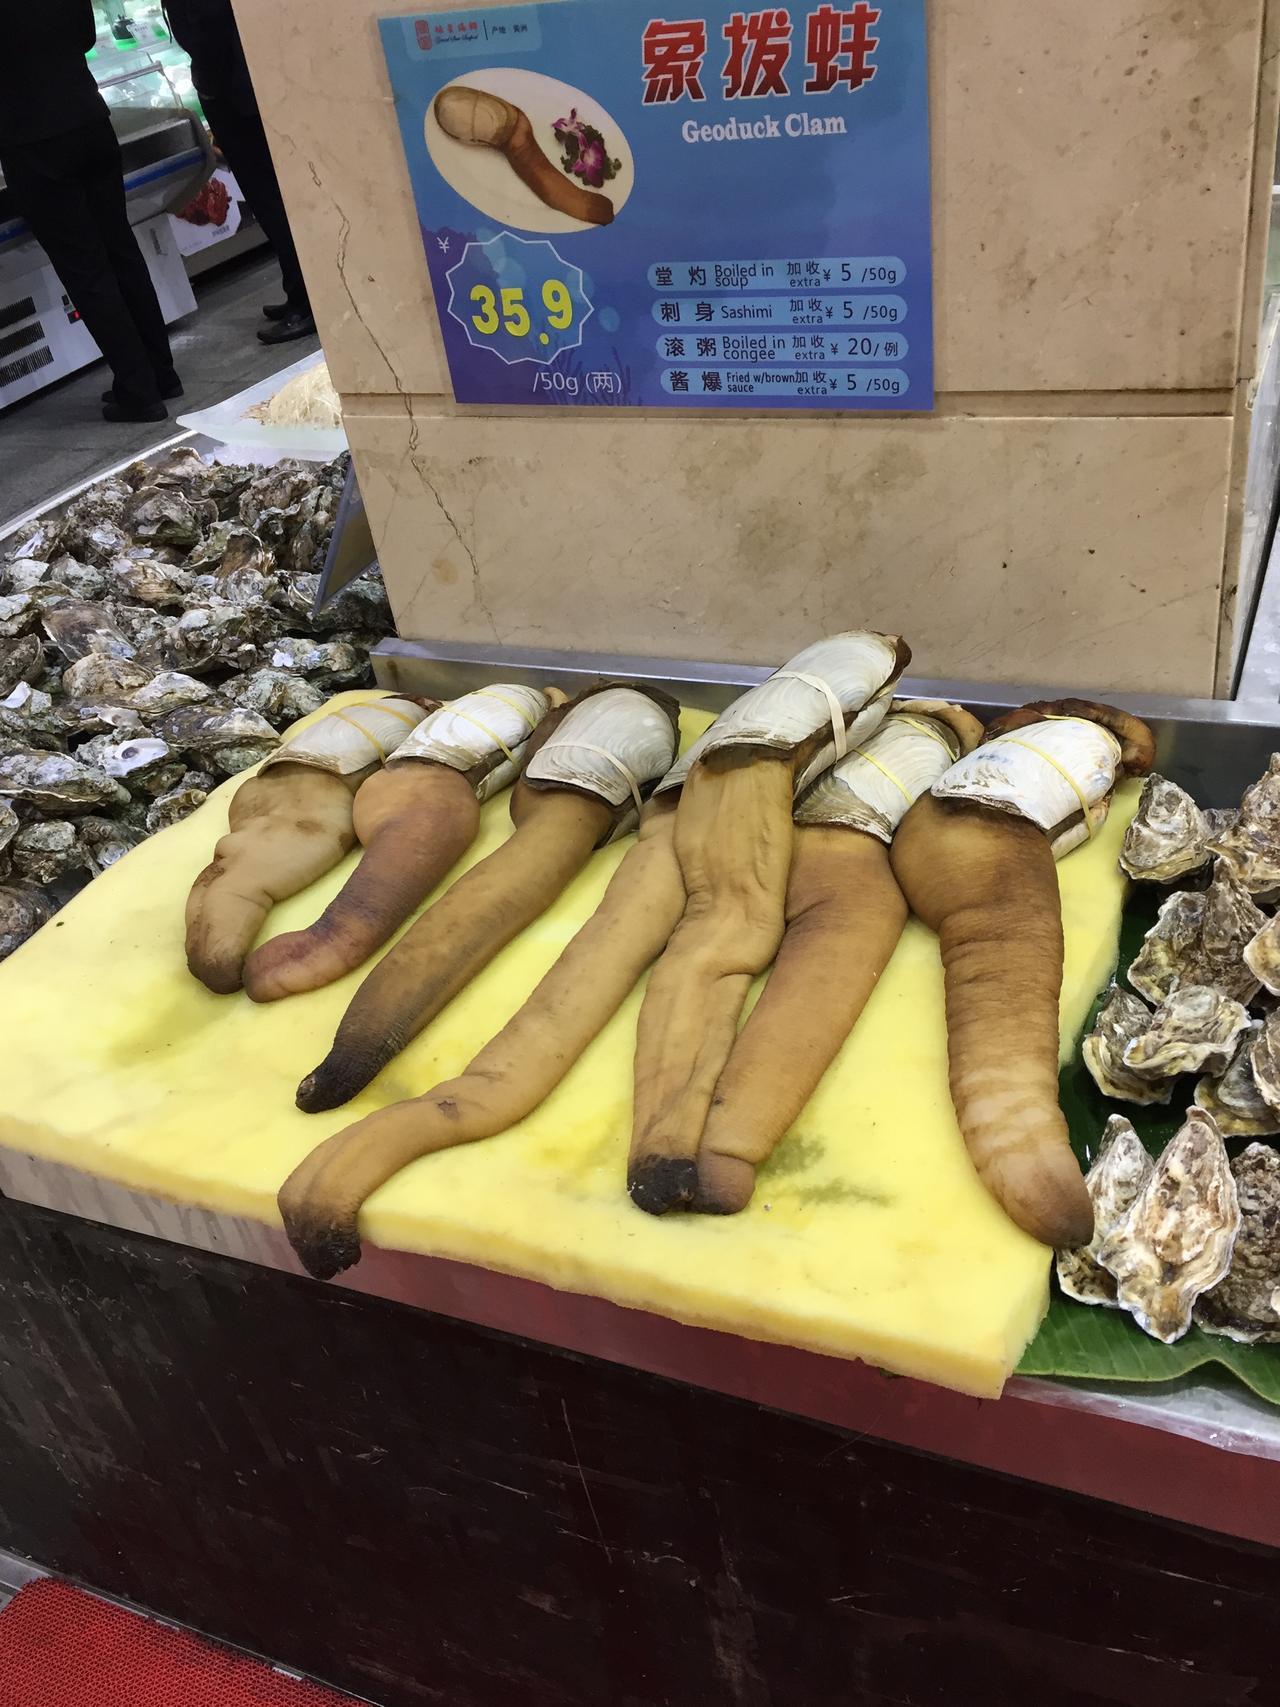 Weird clams at a food market